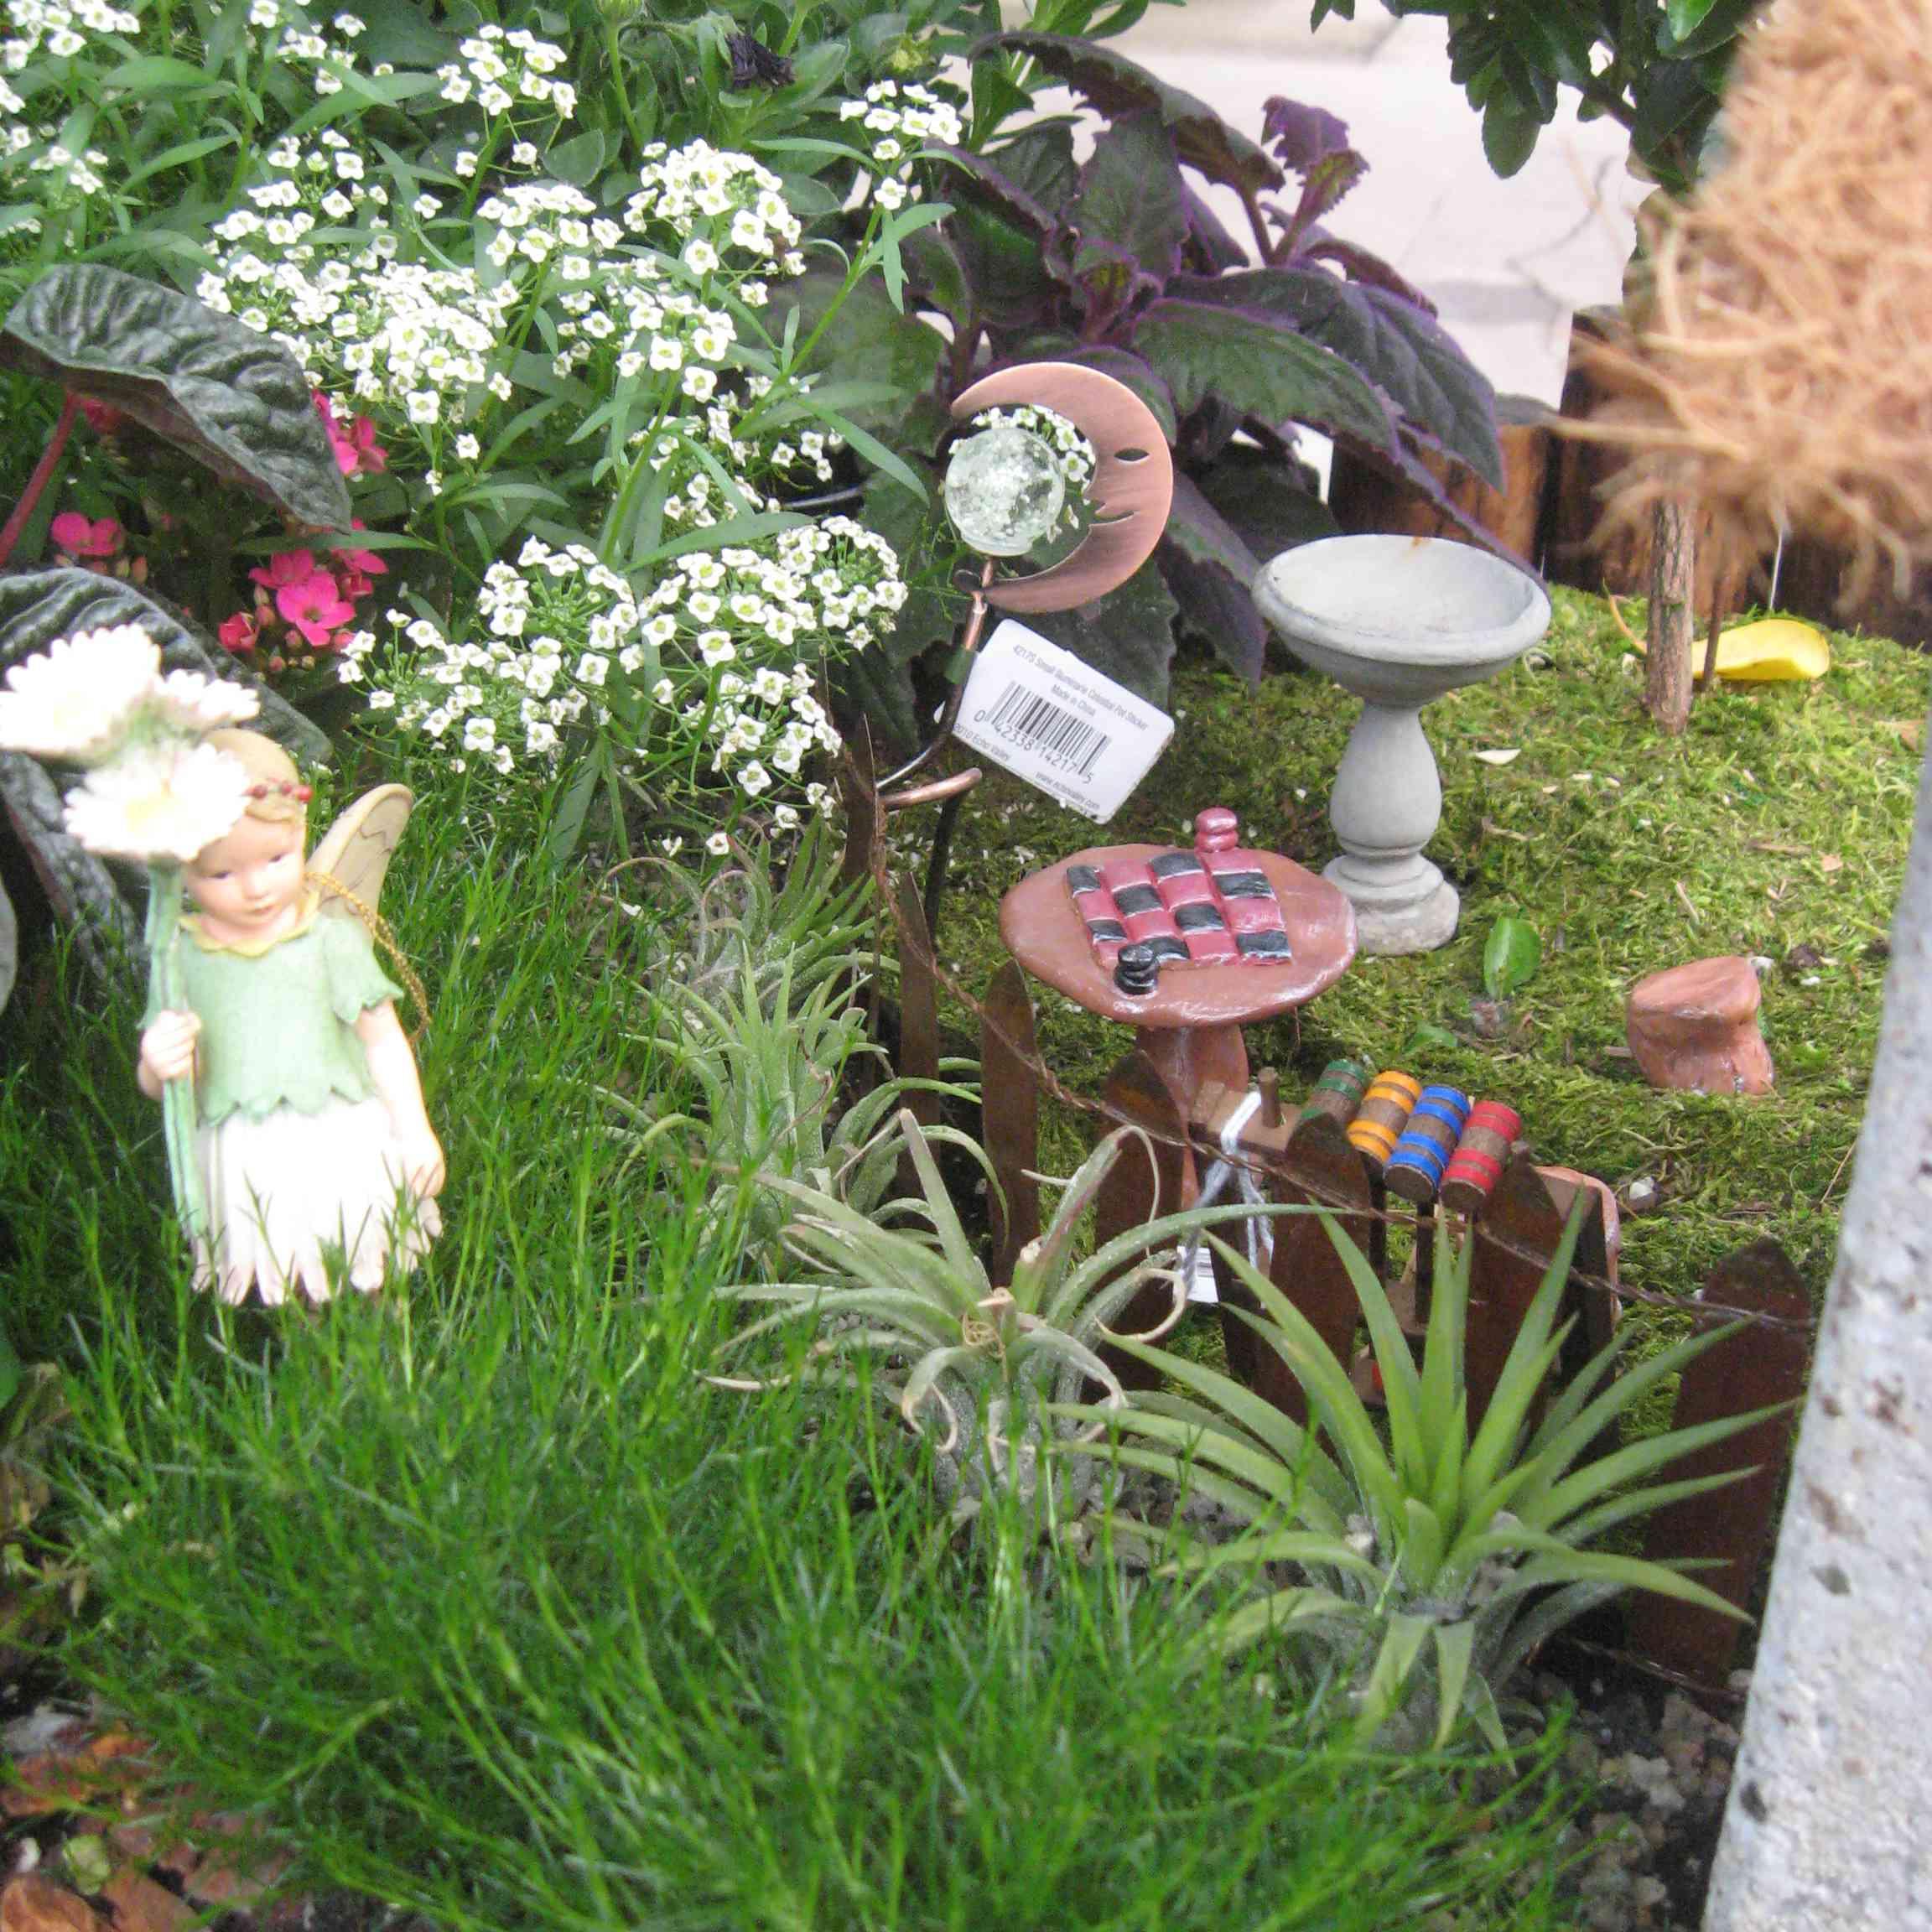 Miniature furniture and fairy statue in garden.